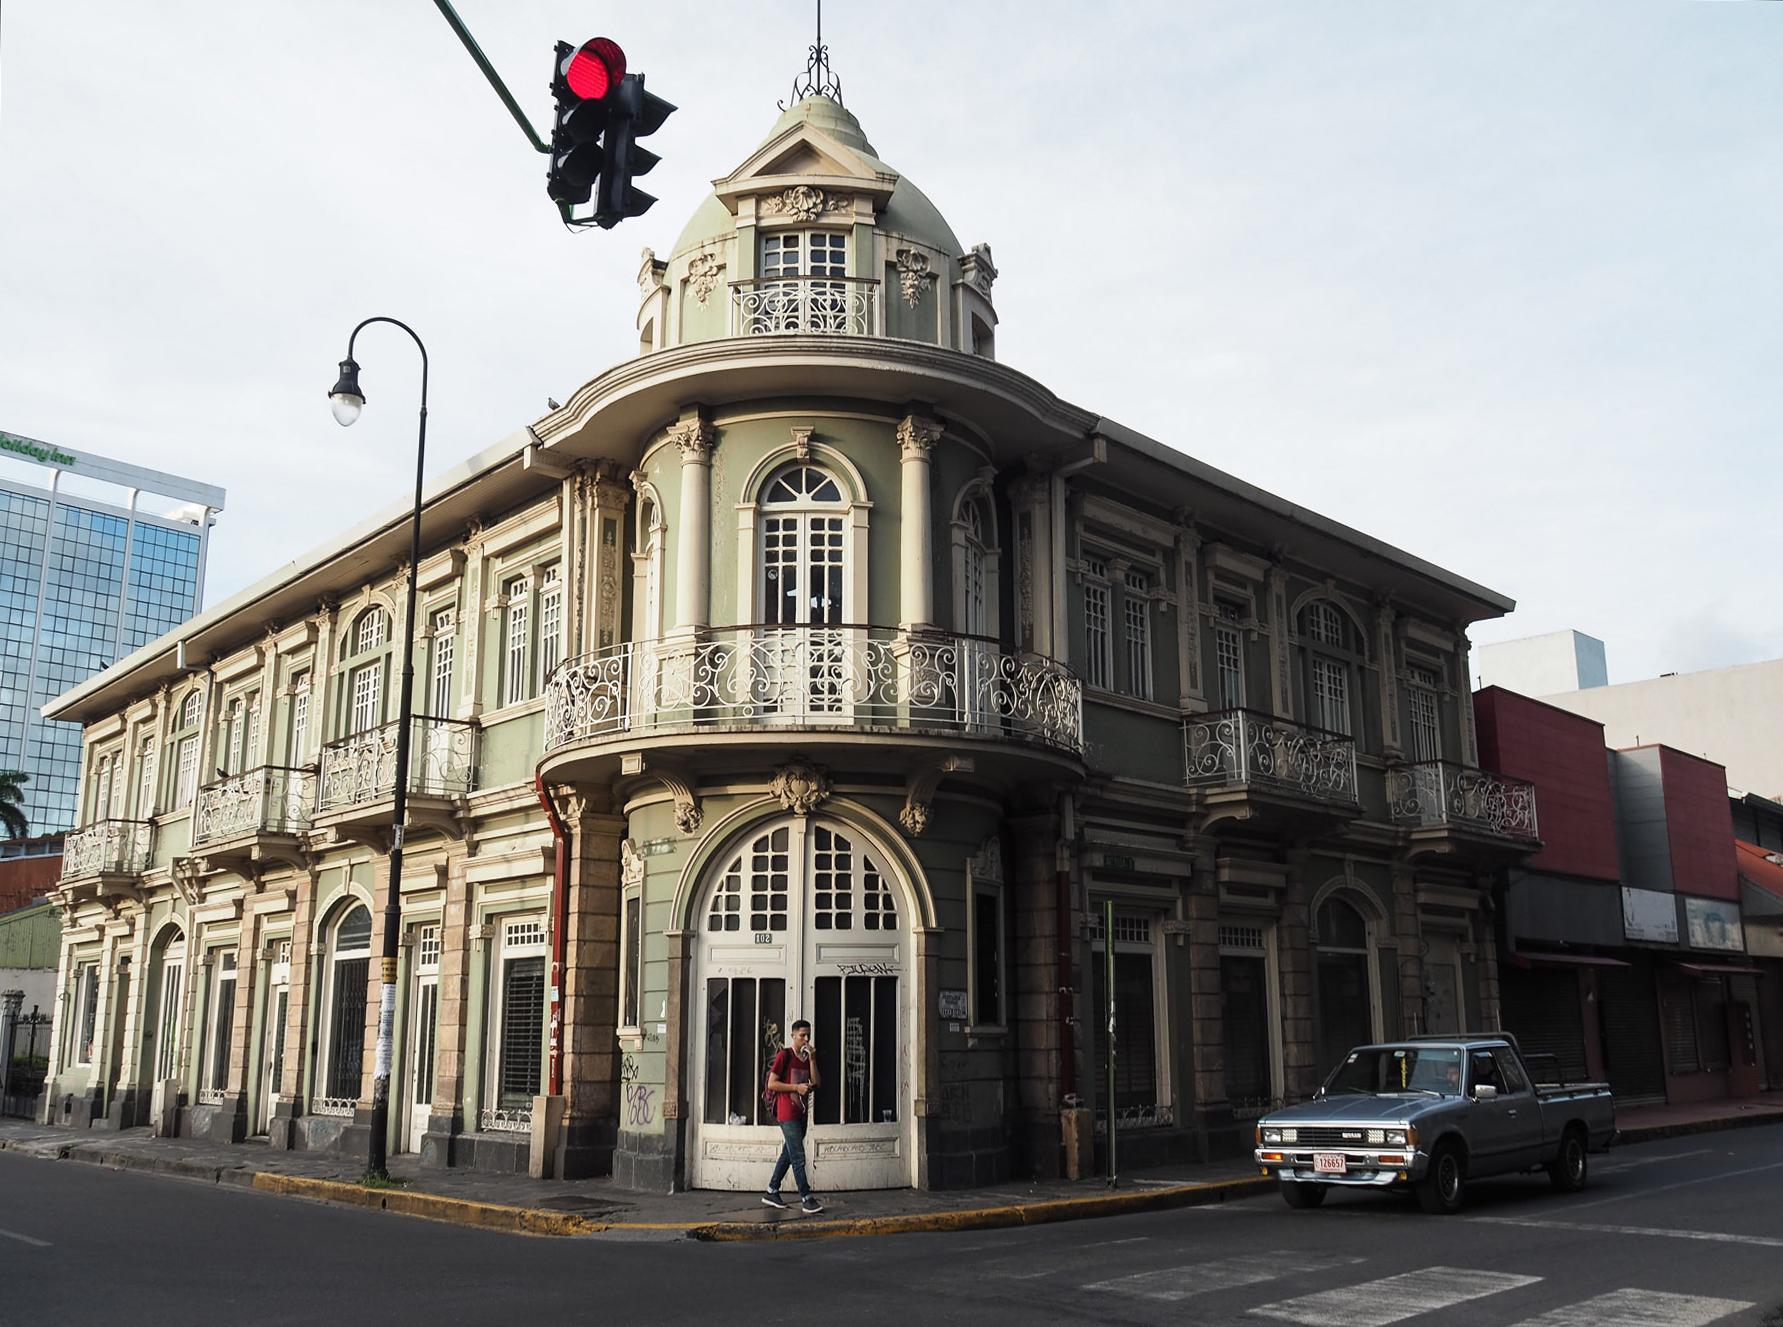 San Josè, die Hauptstadt Costa Ricas, hat wenige interessante Ecken